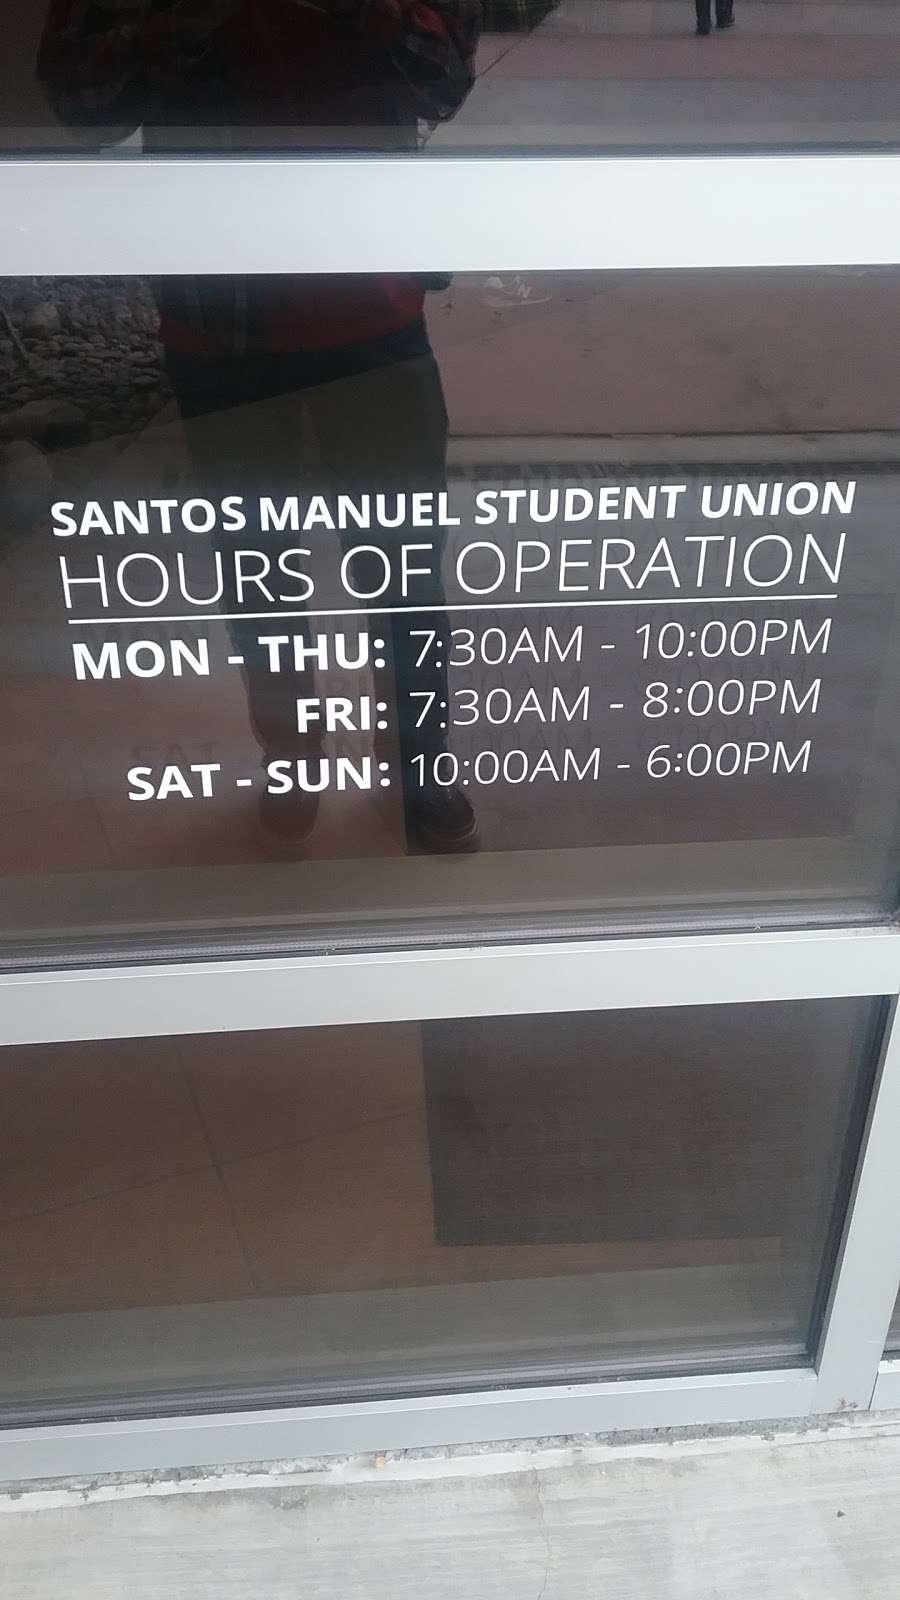 Santos Manuel Student Union - local government office  | Photo 1 of 3 | Address: 5500 University Pkwy, San Bernardino, CA 92407, USA | Phone: (909) 537-7201